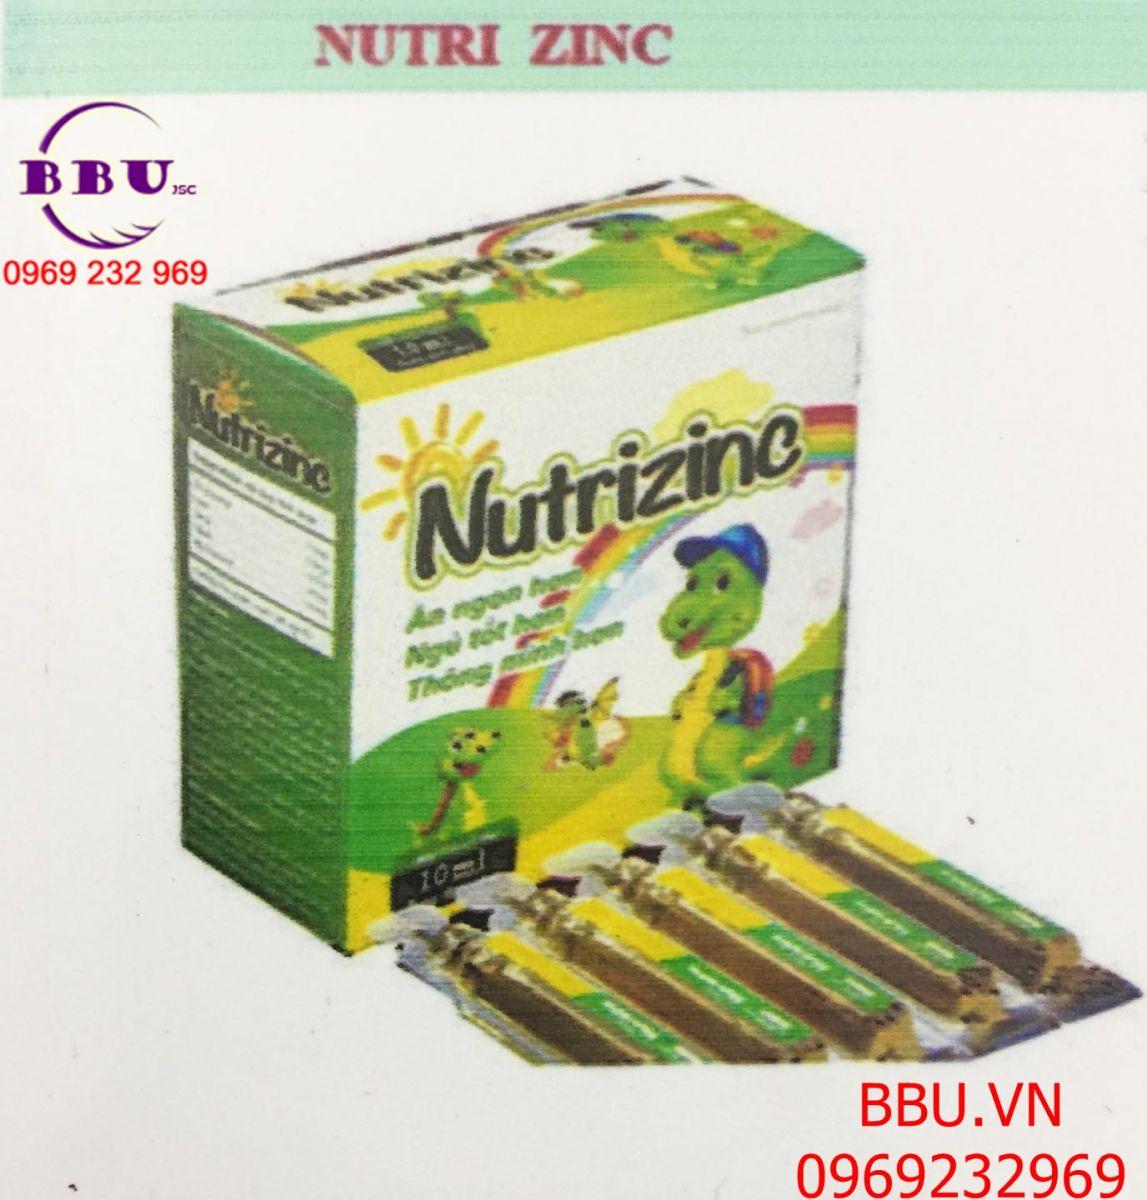 nutrizinc-bo-sung-kem-phat-trien-tri-nao-tang-cuong-mien-dich(1)